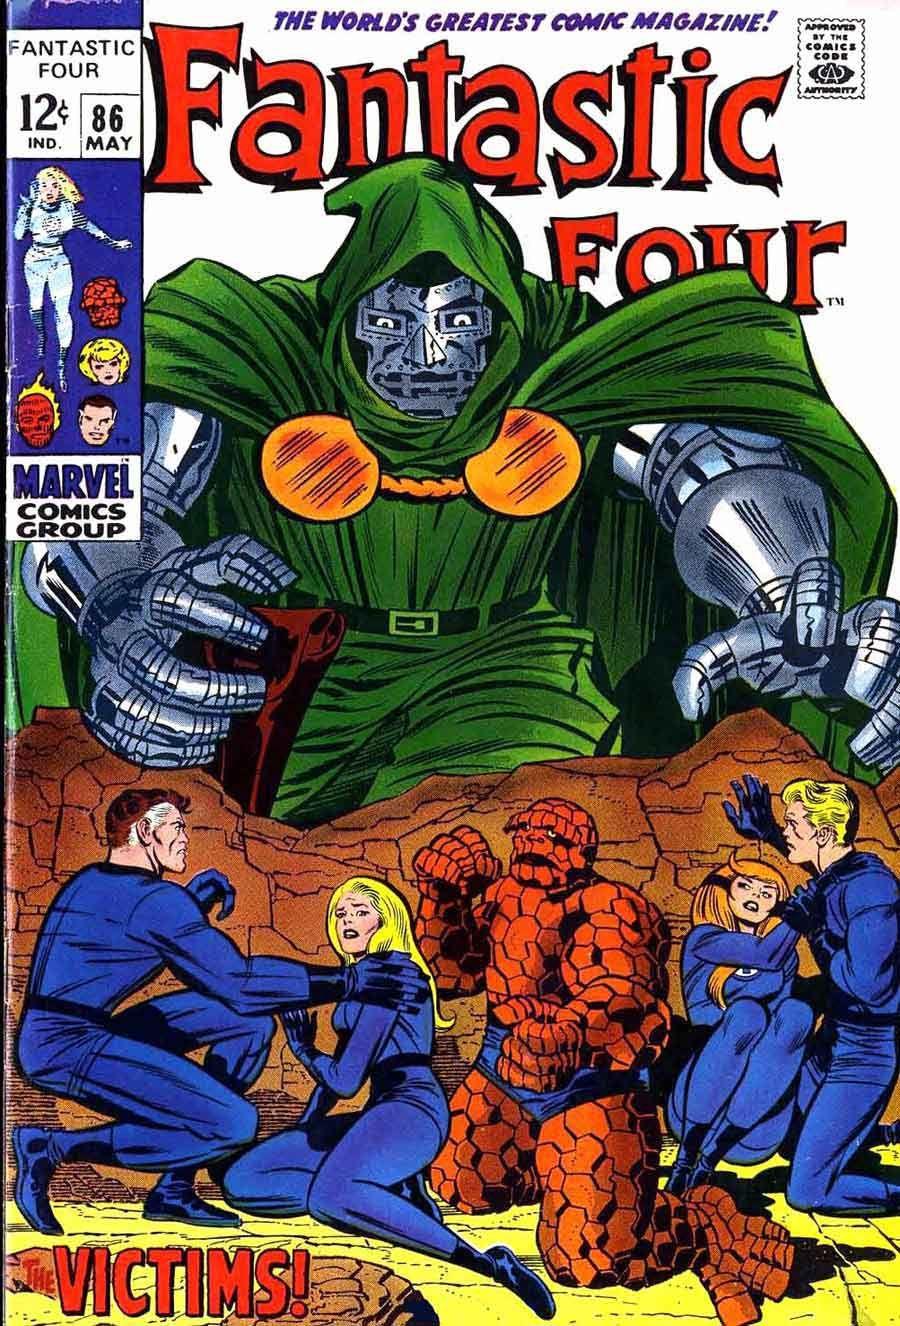 marvel's fantastic four   marvel comics  pinterest  comic  - marvel's fantastic four  comic book coversmarvel